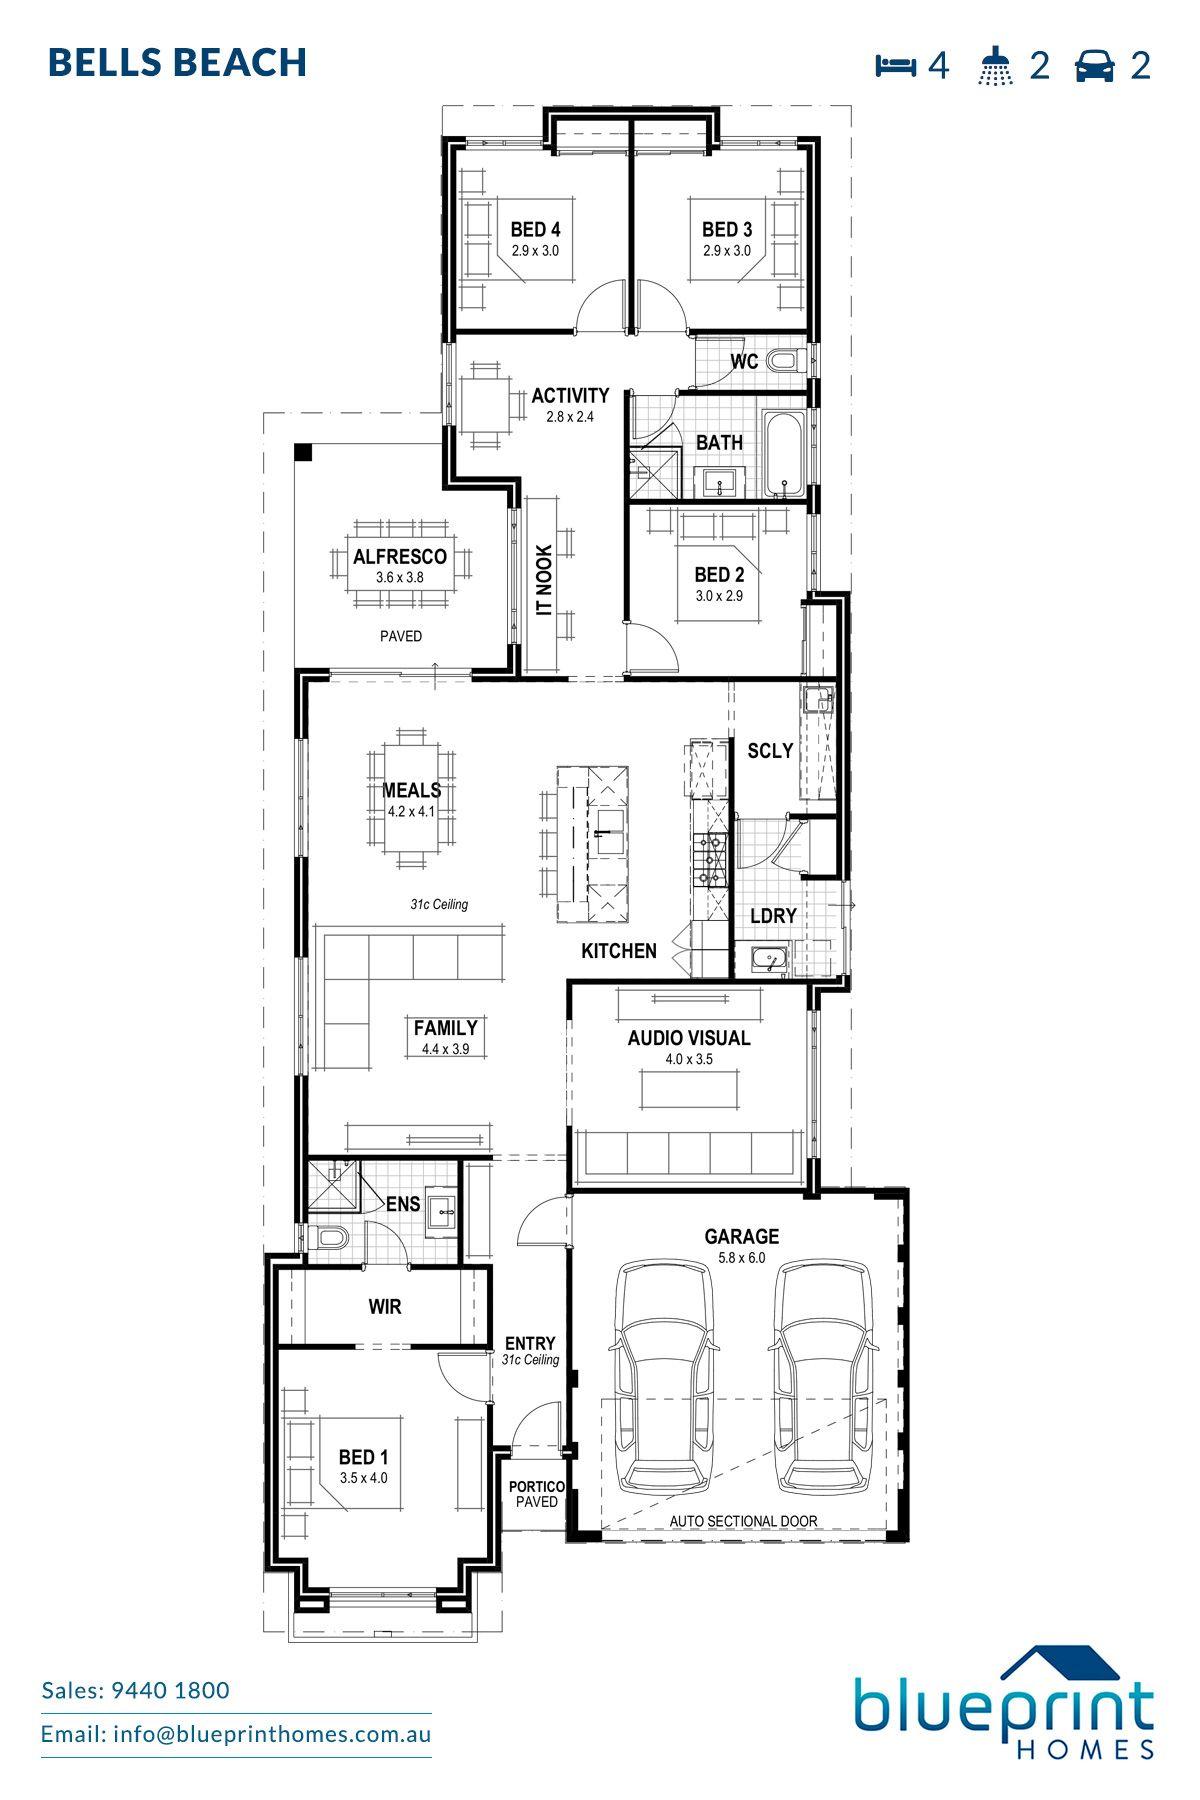 Bells Beach Perth Home Design Blueprint Homes House Design Home Design Plans Beach House Design